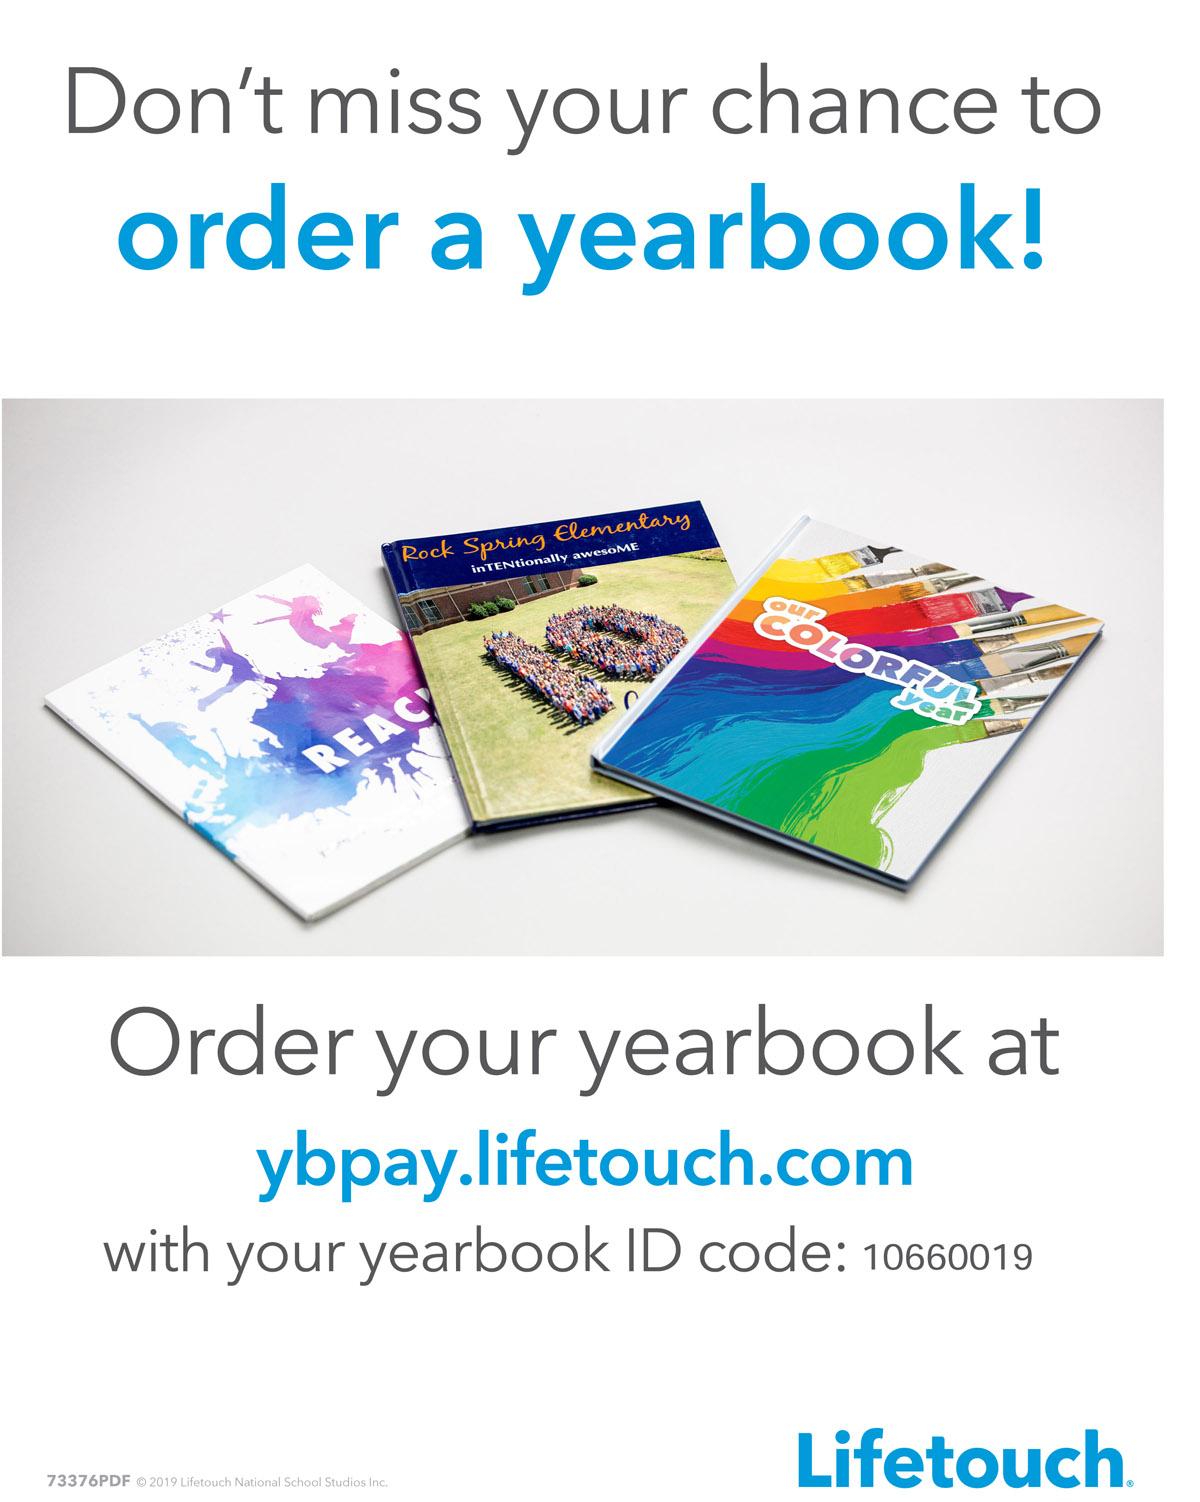 Goff Yearbook flyer